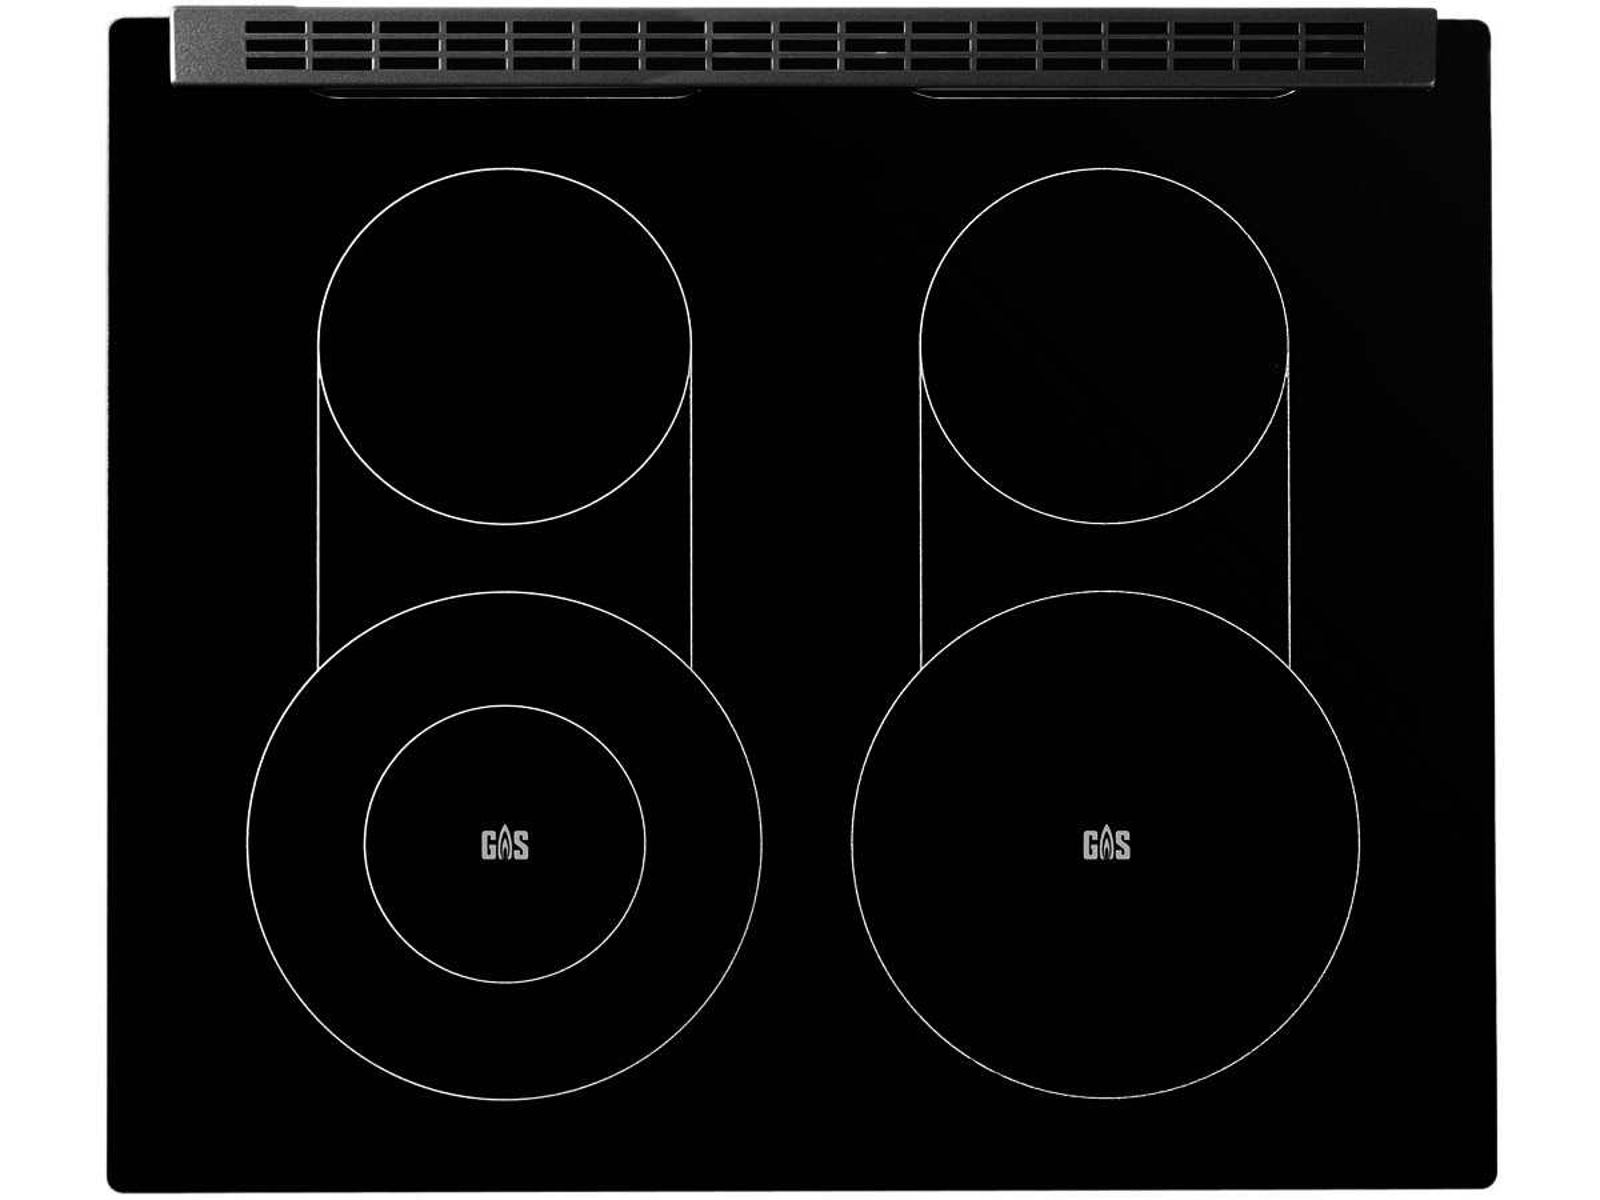 oranier set herd ehg 3010 gas unter glas kochfeld ekg 6 08 ebay. Black Bedroom Furniture Sets. Home Design Ideas